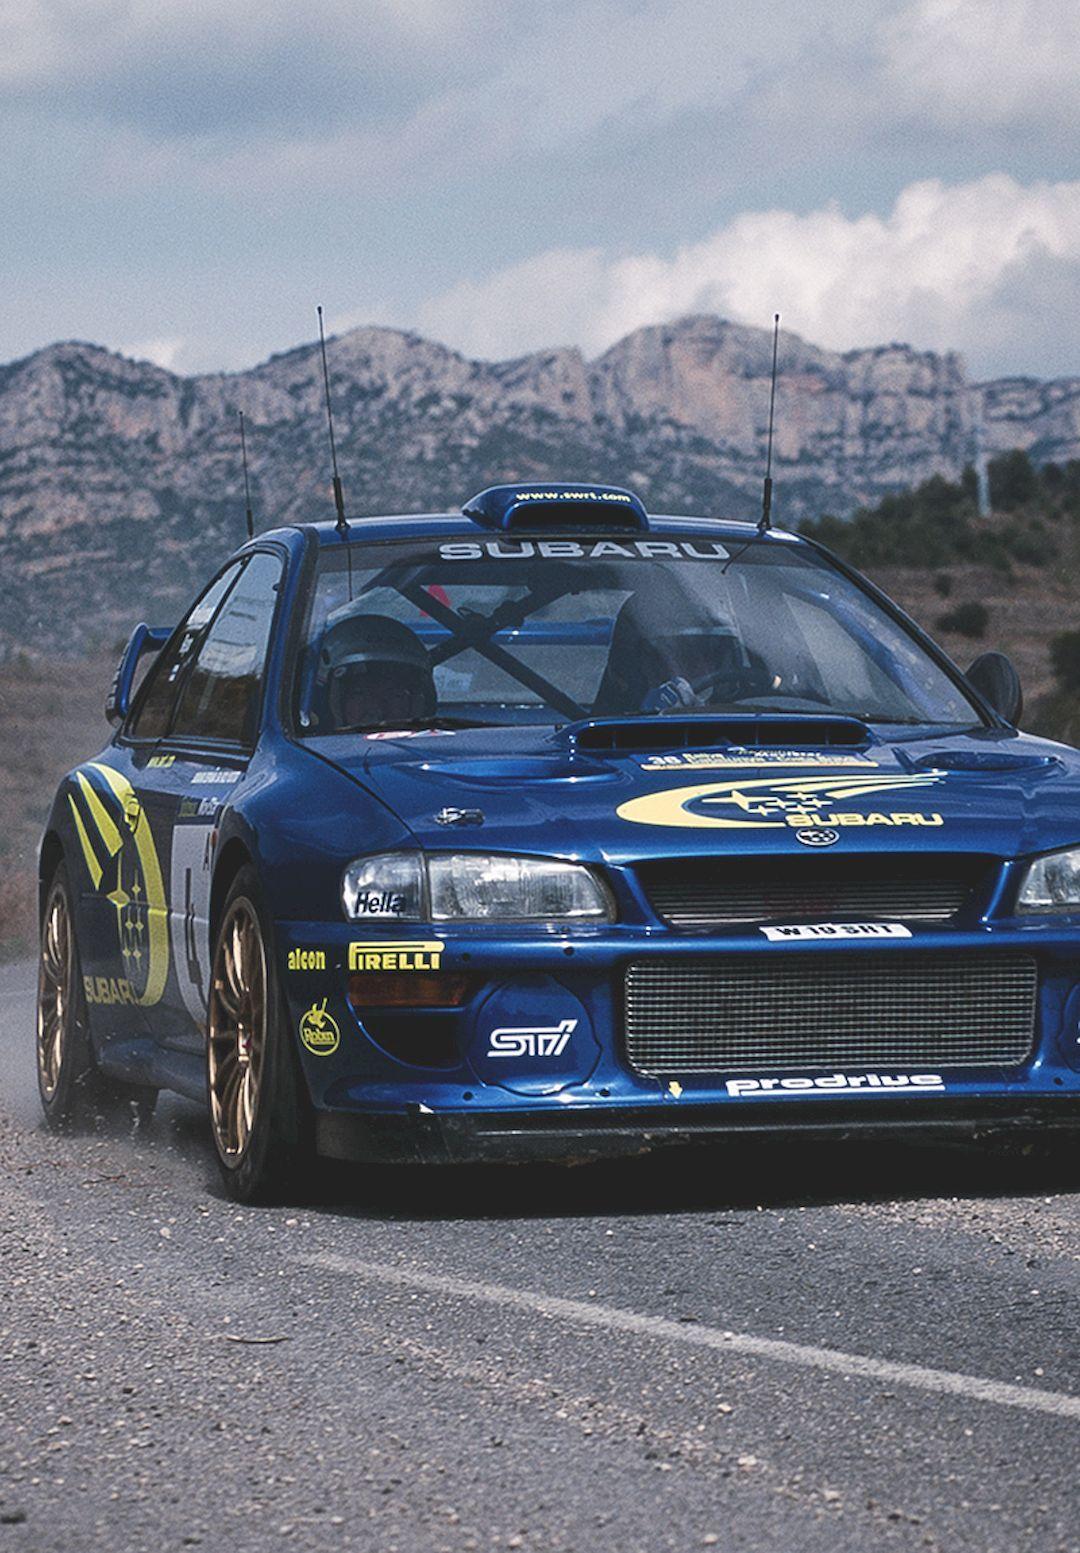 111 Coolest Subaru Impreza WRX Modifications | Pinterest | Subaru ...